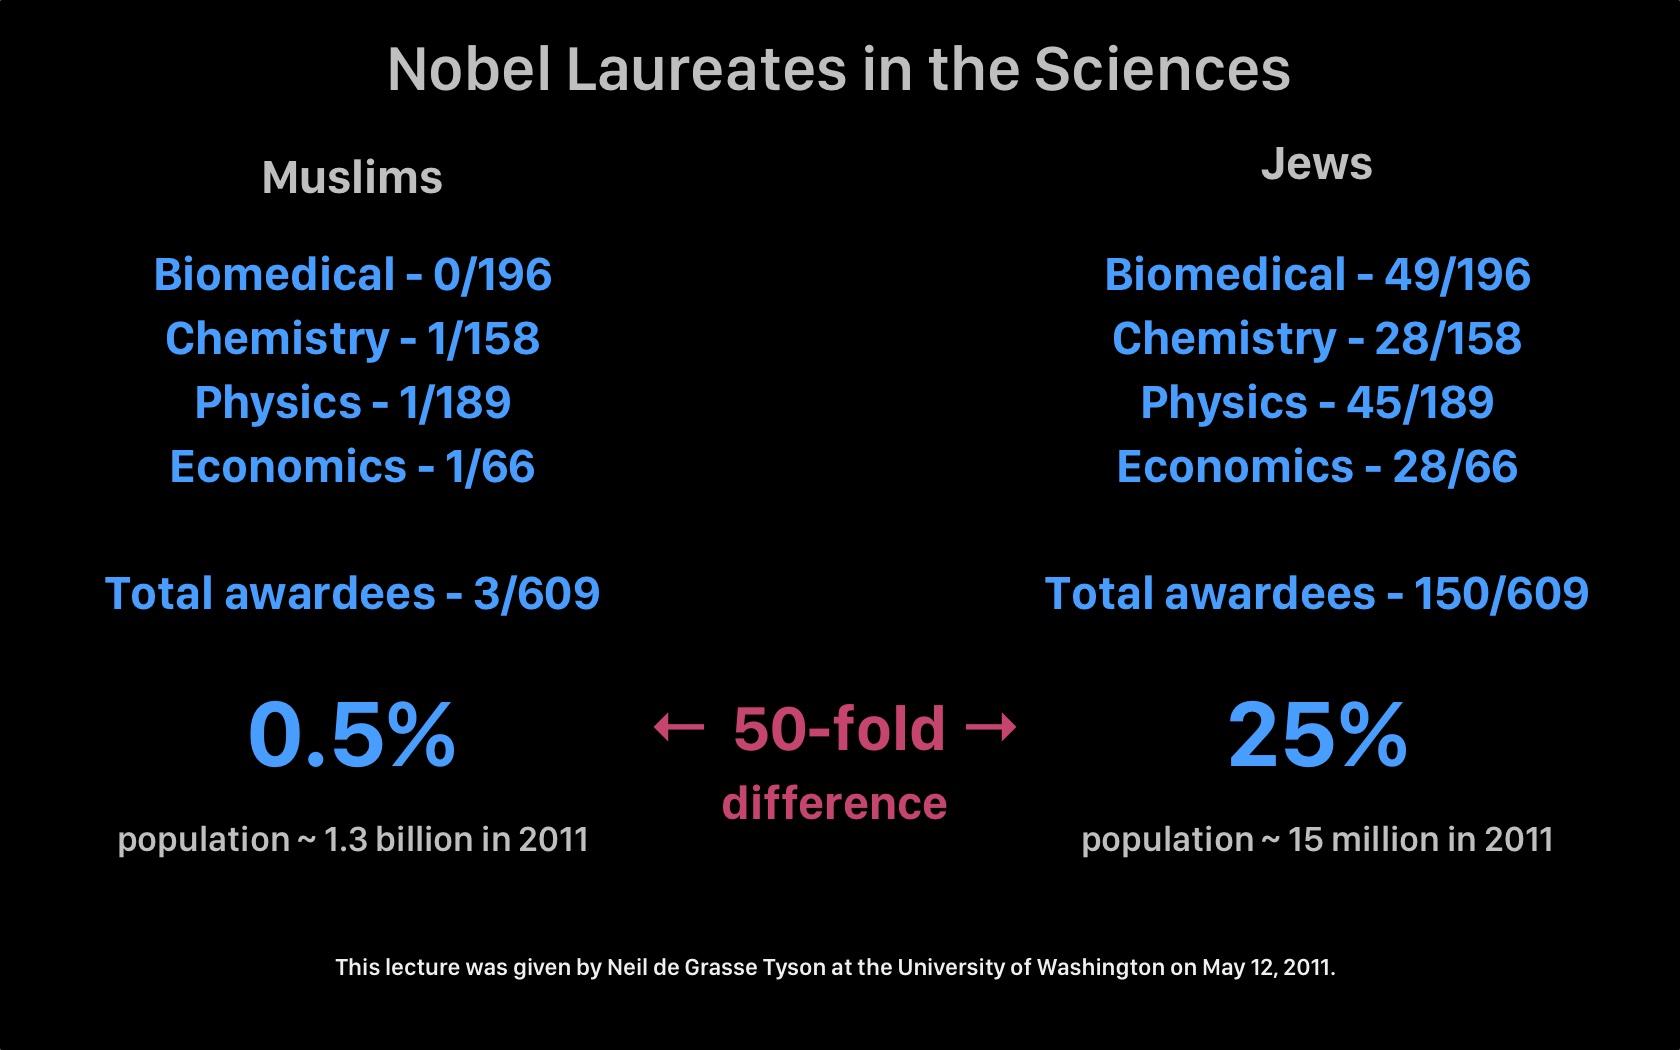 Neil de Grasse Tyson compares the number of Nobel Laureates in the sciences